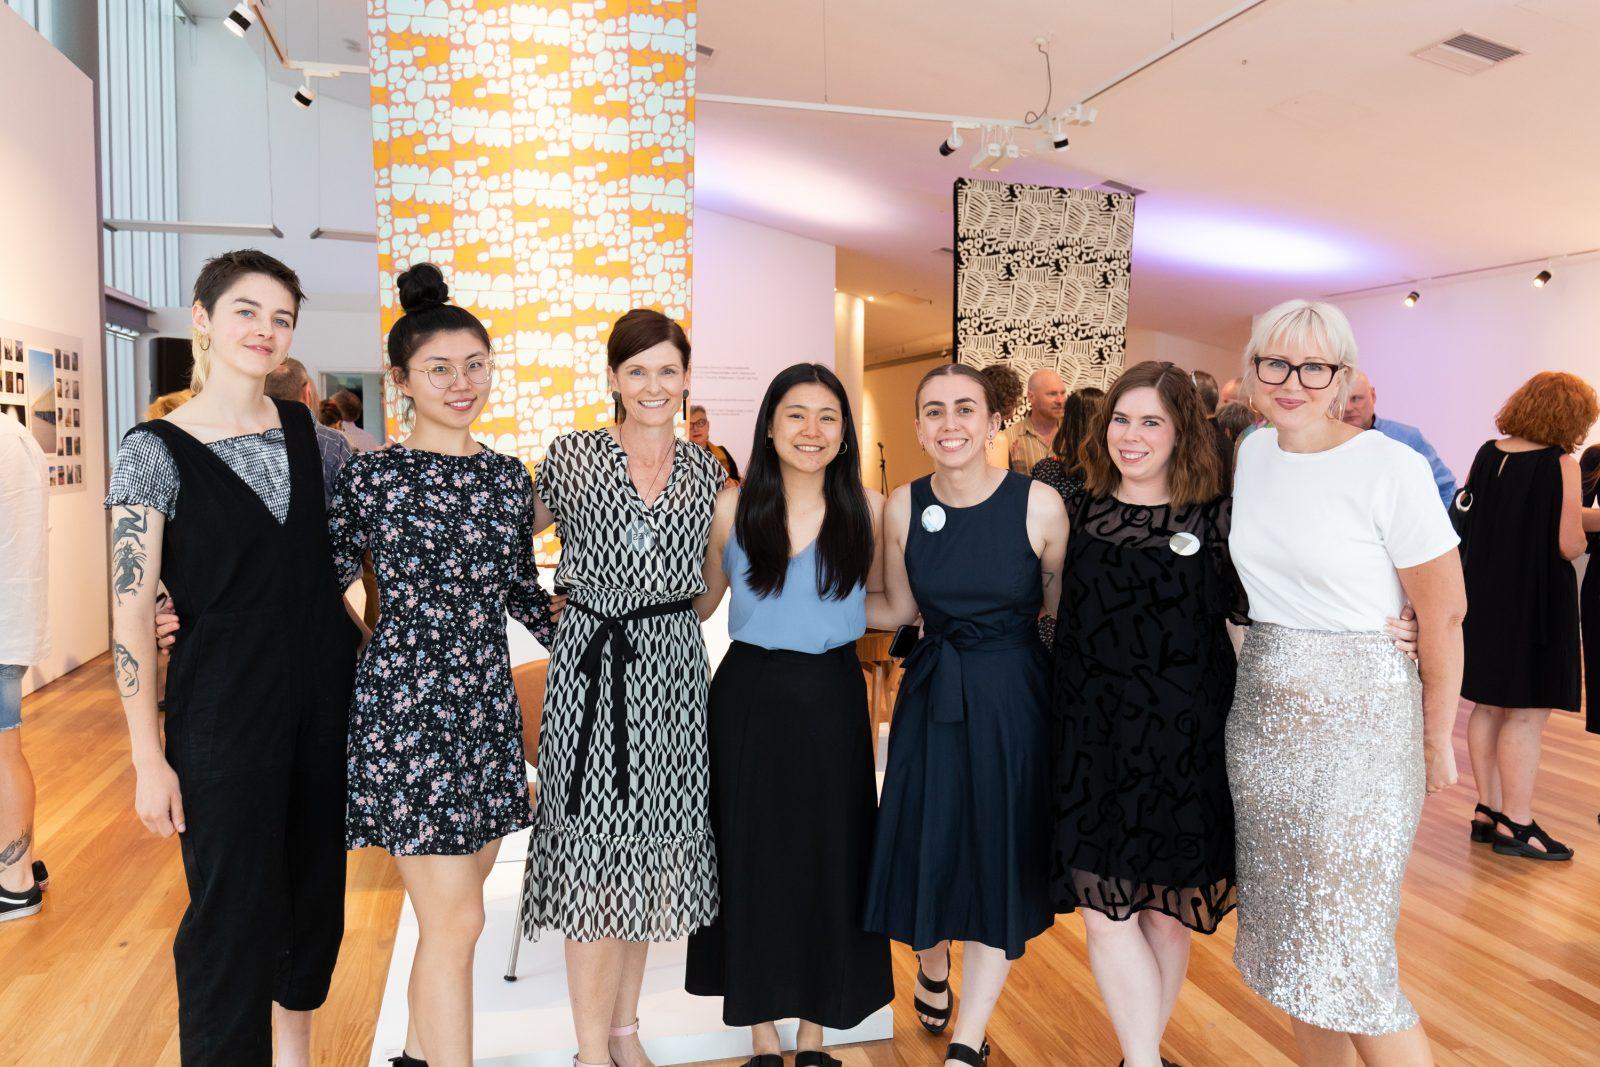 Craft ACT staff (L-R), Annie Parnell, Selena Kang, Rachael Coghlan, Vy Tsan, Madisyn Zabel, Meagan Jones and Kate Nixon. Photo: 5 Foot Photography